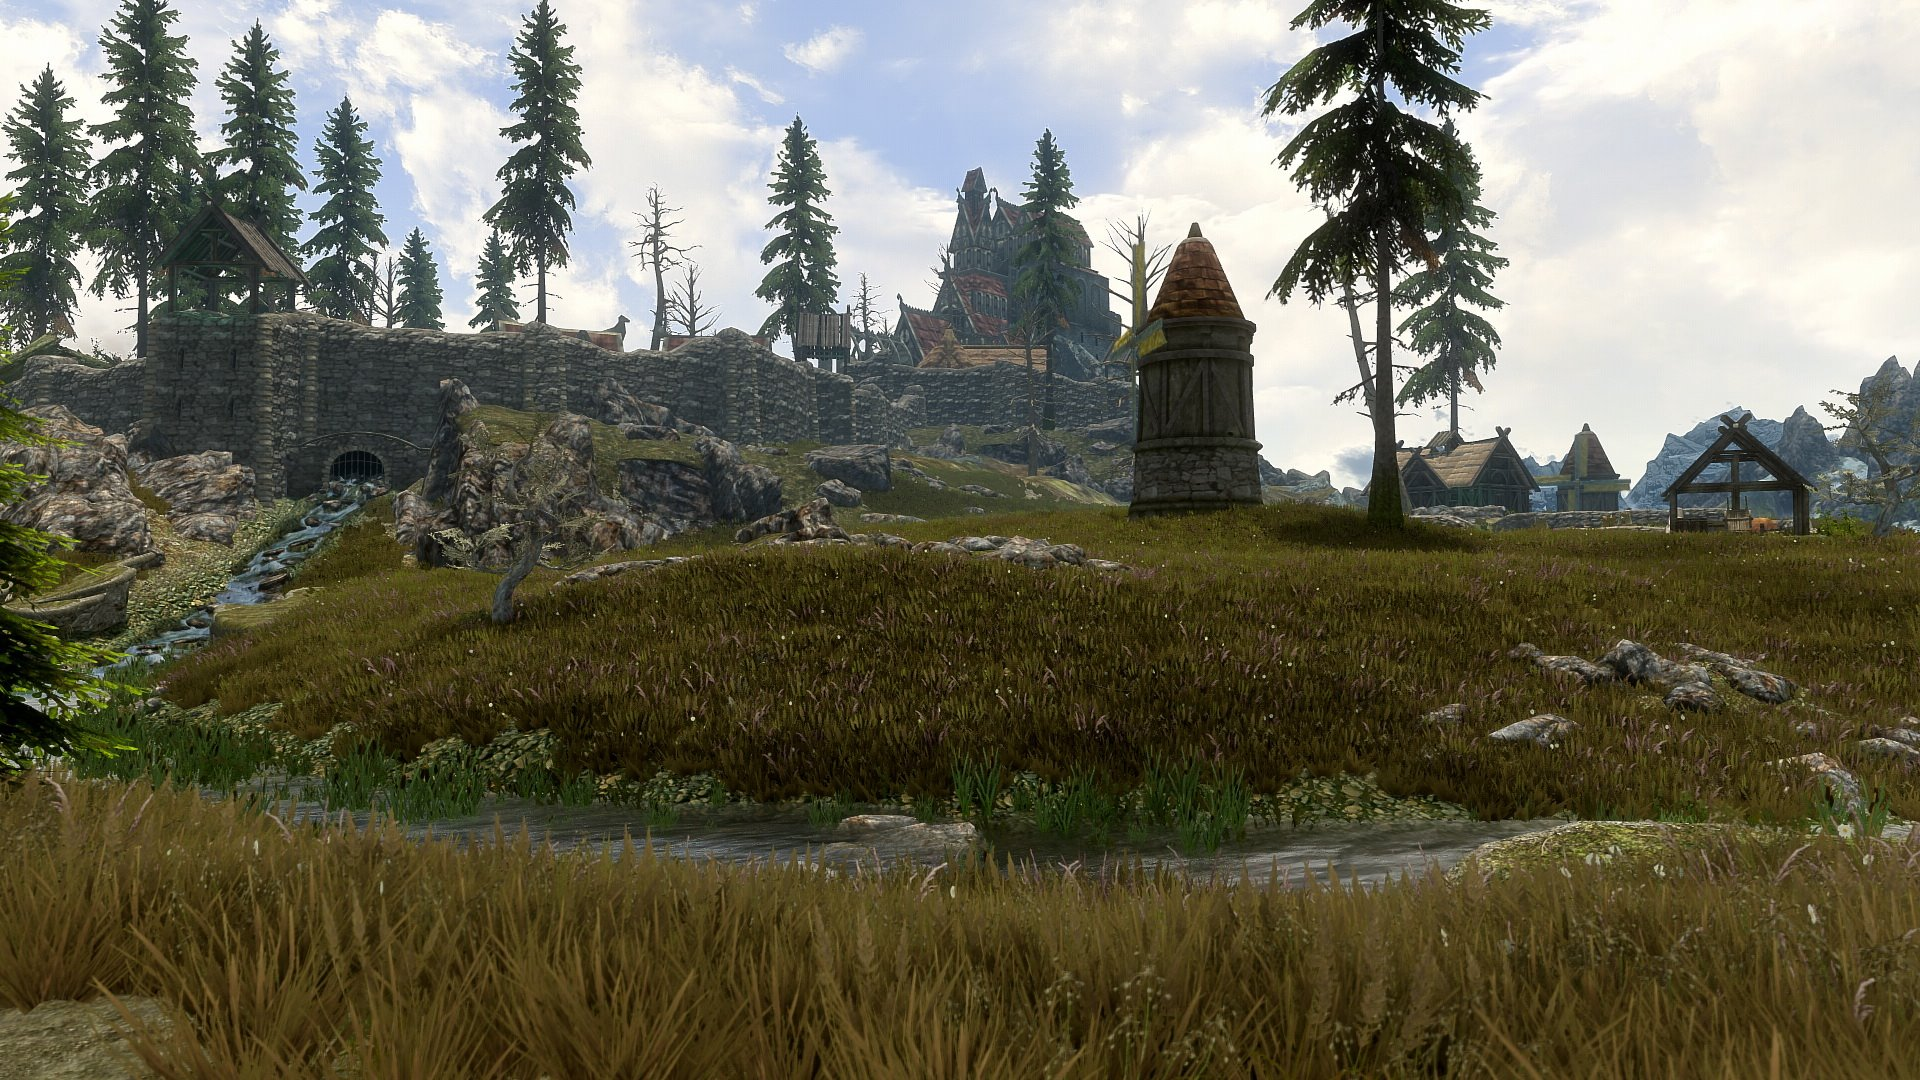 Skyrim: Special Edition ENB mod teased